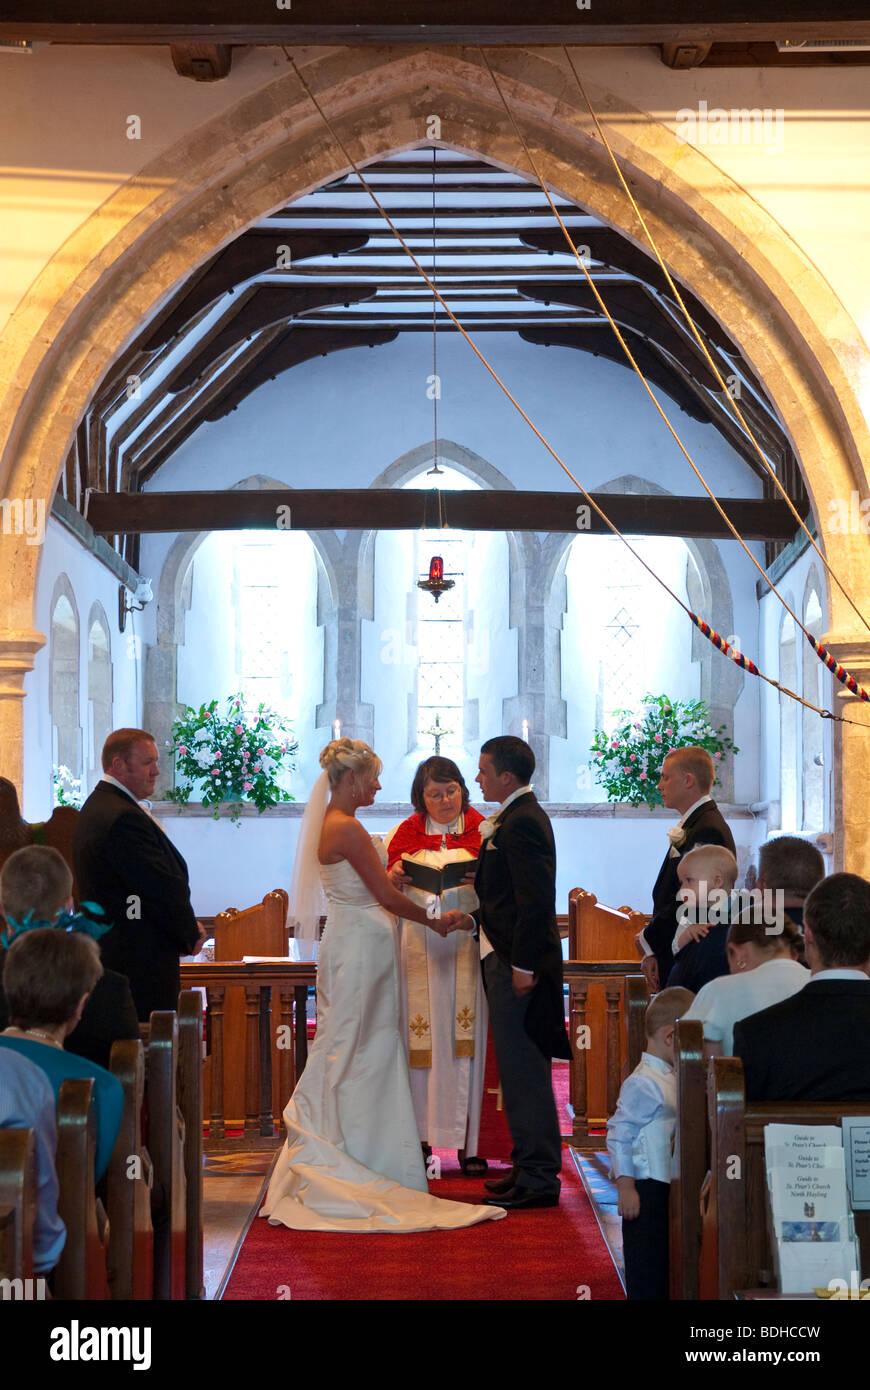 Wedding Service In Church Of England Church Stock Photo 25583849